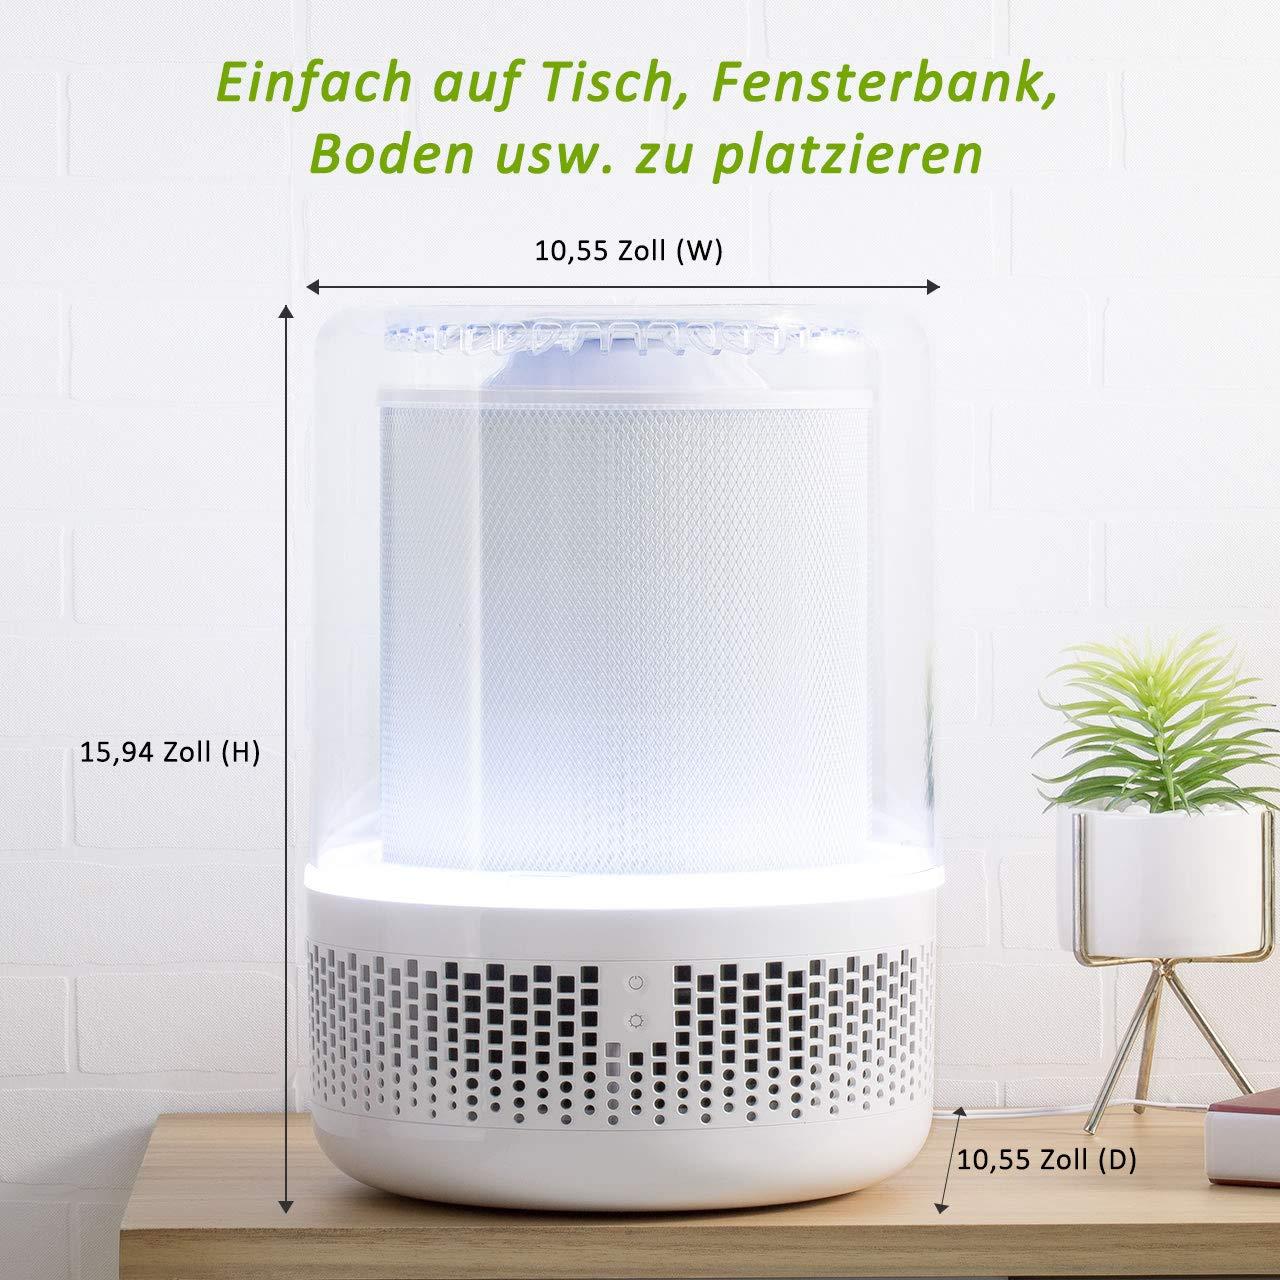 Plastic LED Grow Light E27 Bulb Grow Hydroponic Lamp 9RED+3BLUE 85-265V 36W